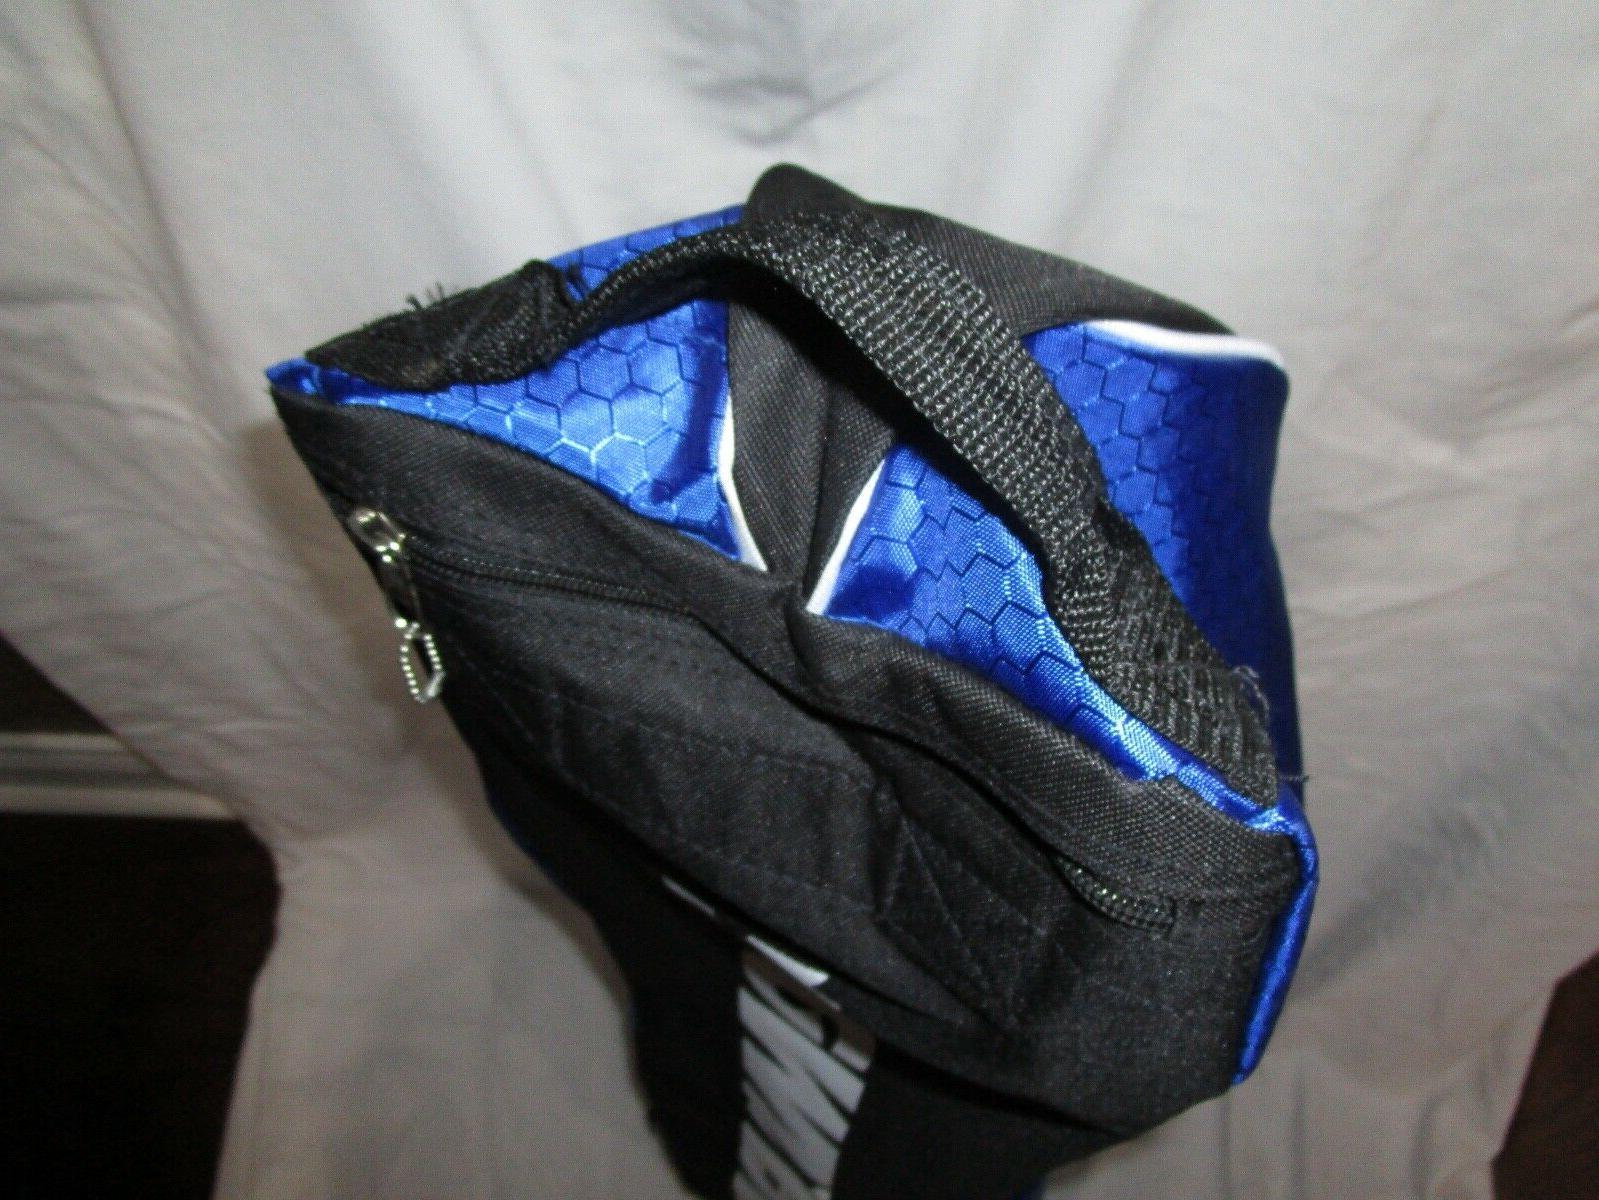 BASEBALL ROYAL BLUE & BLACK, ON WHEELS, TAGS